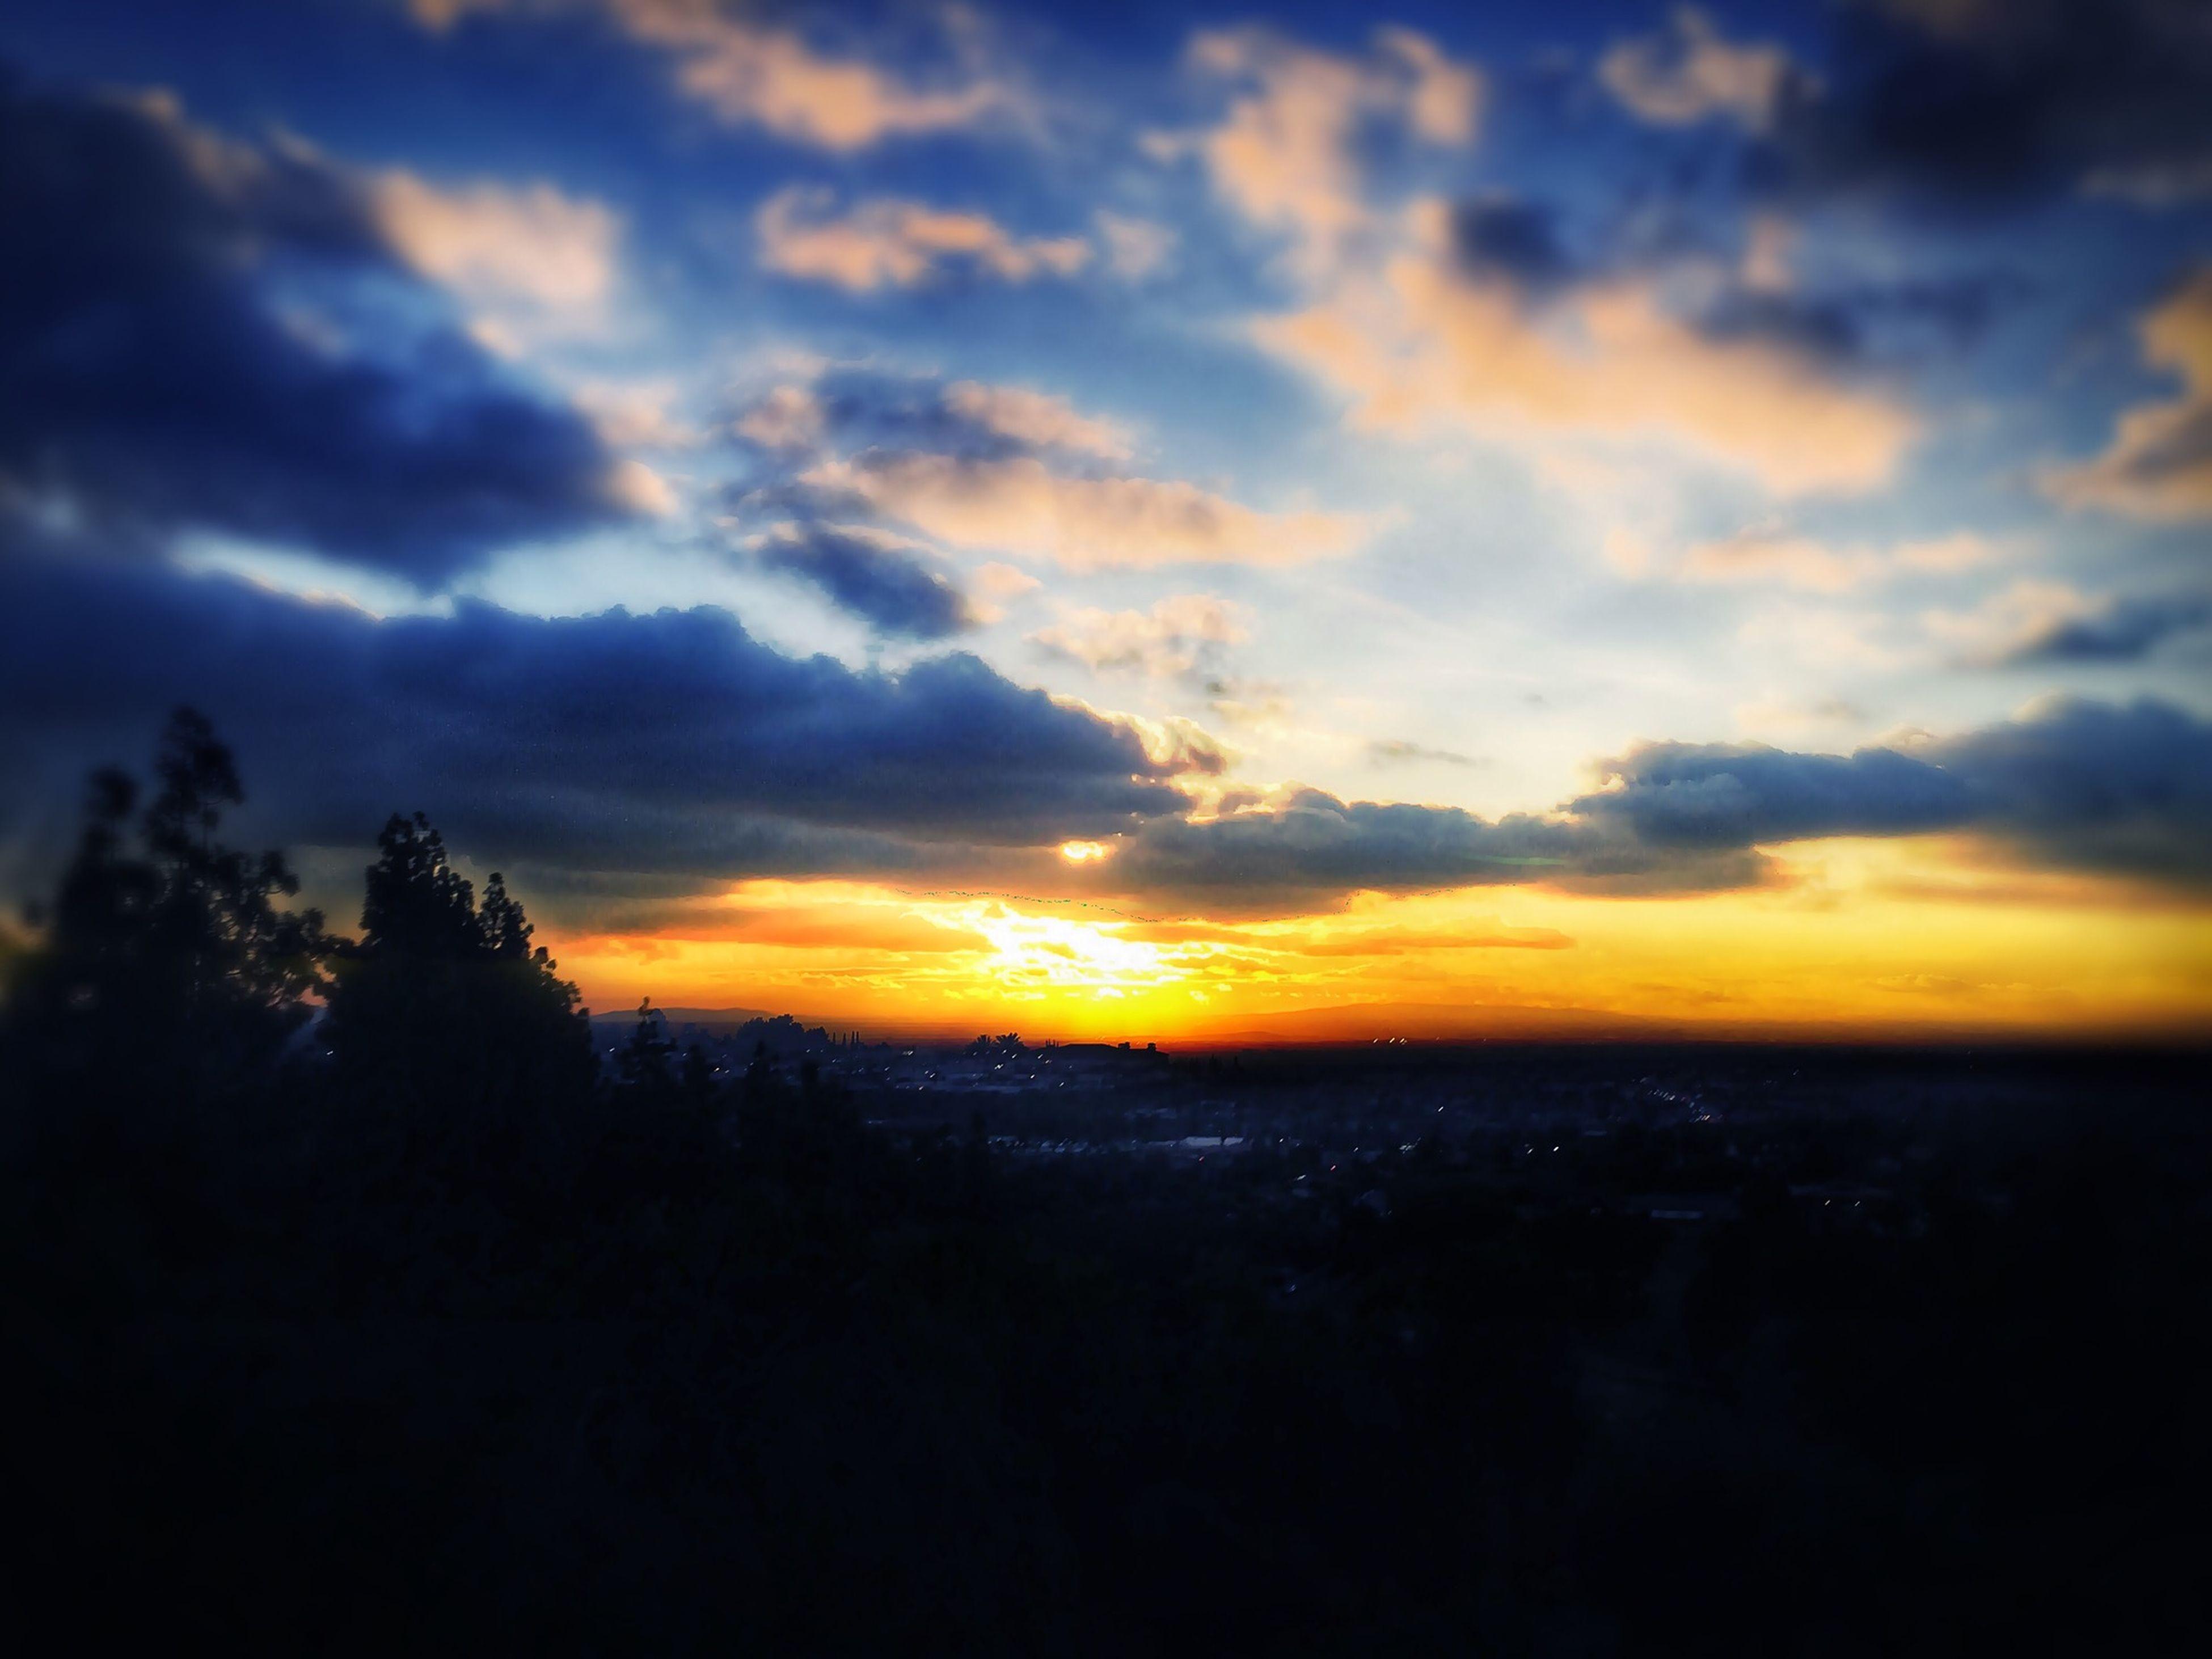 sunset, silhouette, scenics, orange color, sky, beauty in nature, tranquil scene, tranquility, idyllic, cloud - sky, nature, dramatic sky, landscape, dark, cloud, tree, sun, majestic, moody sky, outdoors